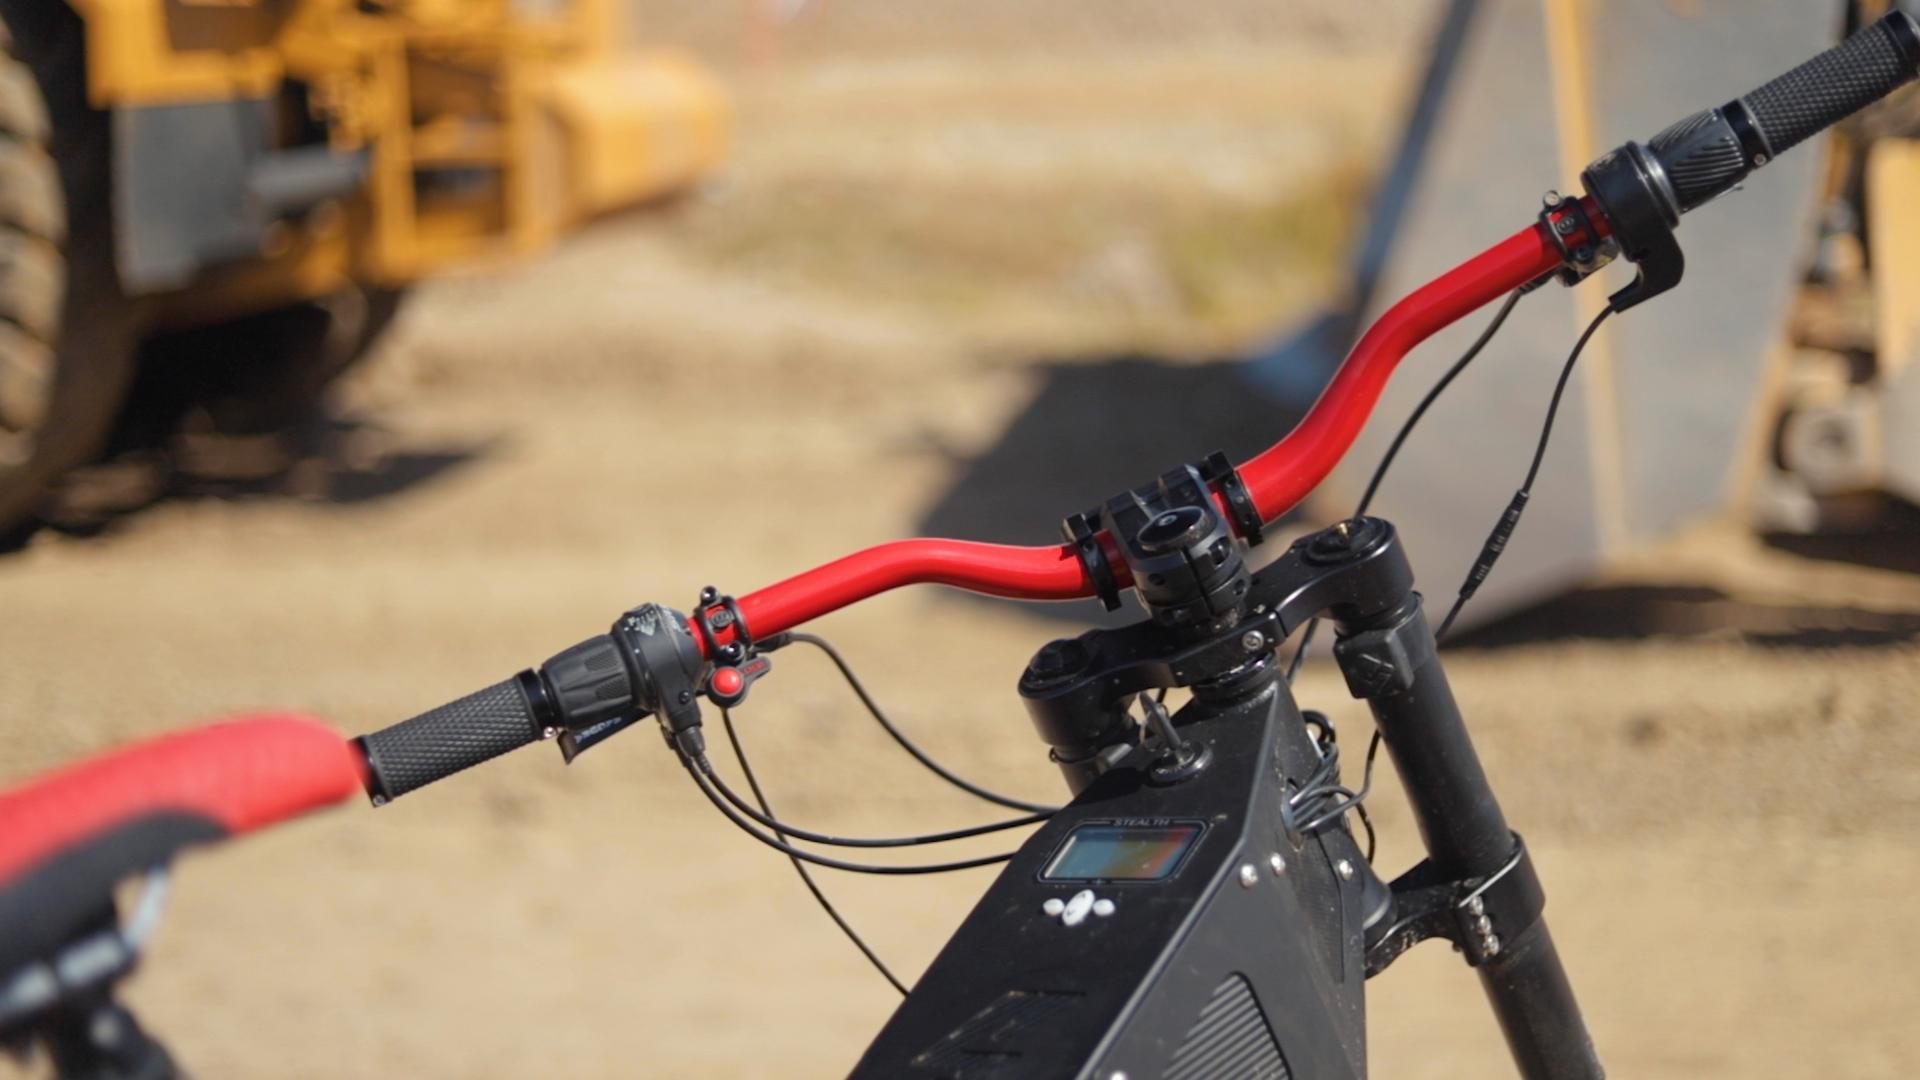 electrified-reviews-stealth-b52-bomber-electric-bike-review-handlebars-2.jpg